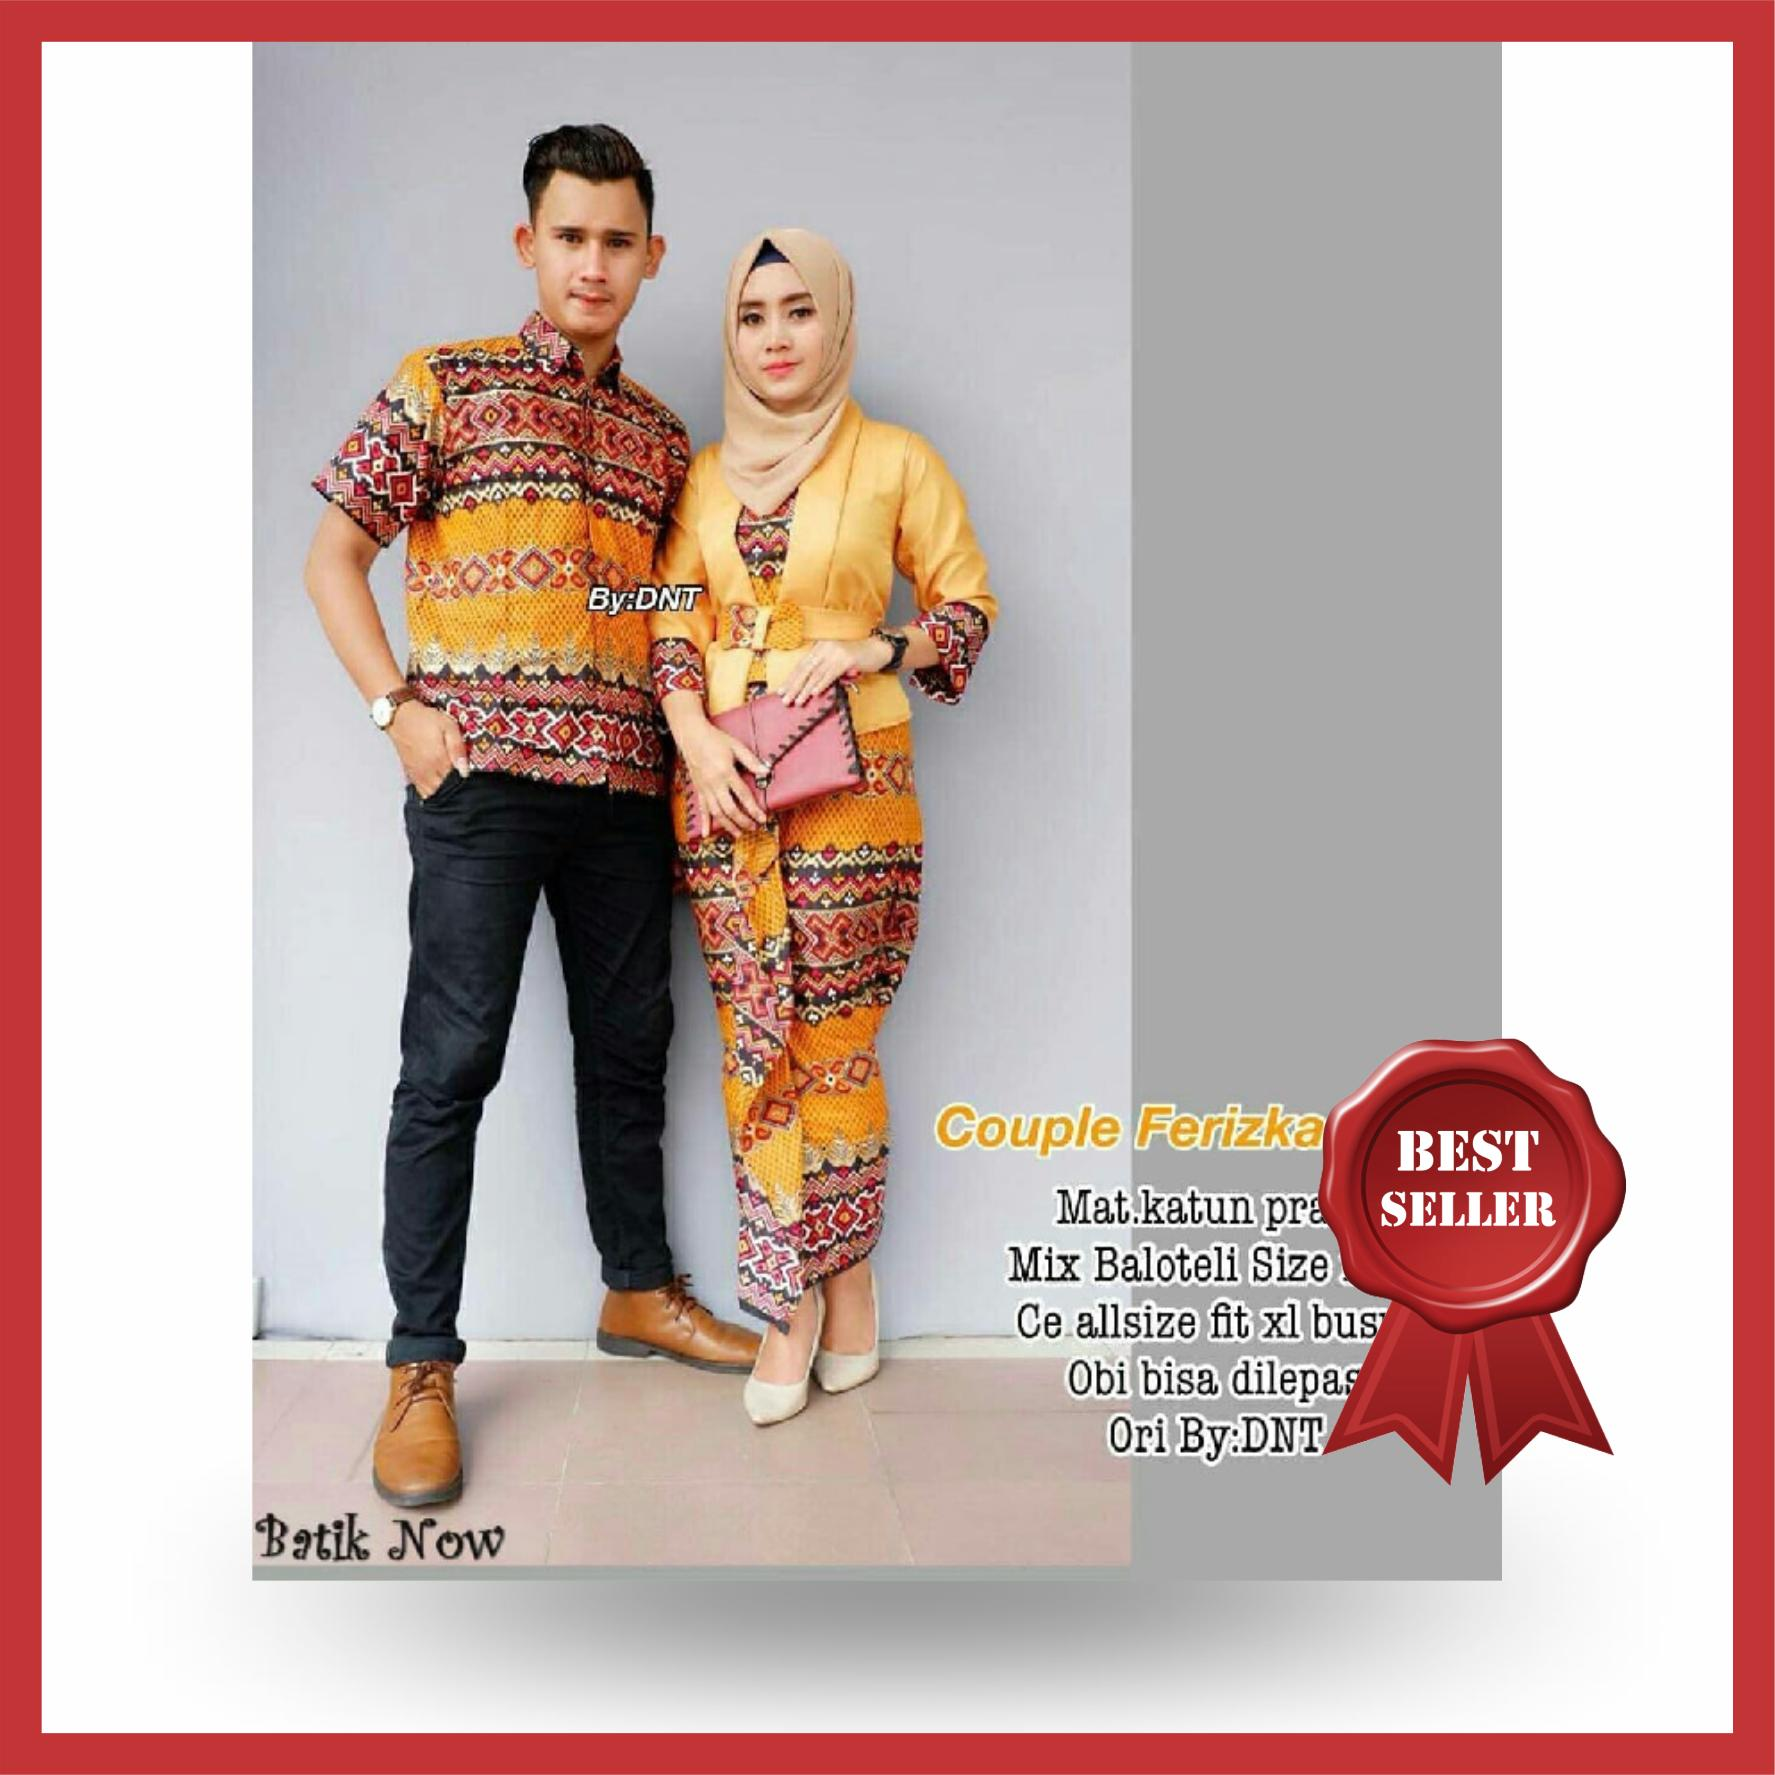 Kemeja Batik / Kemeja Batik Pasangan / Baju Batik Modern / Batik Couple / Batik Sarimbit / Batik Kondangan / Batik Modern / Batik Keluarga / Batik Pasangan / Baju Batik Pasangan